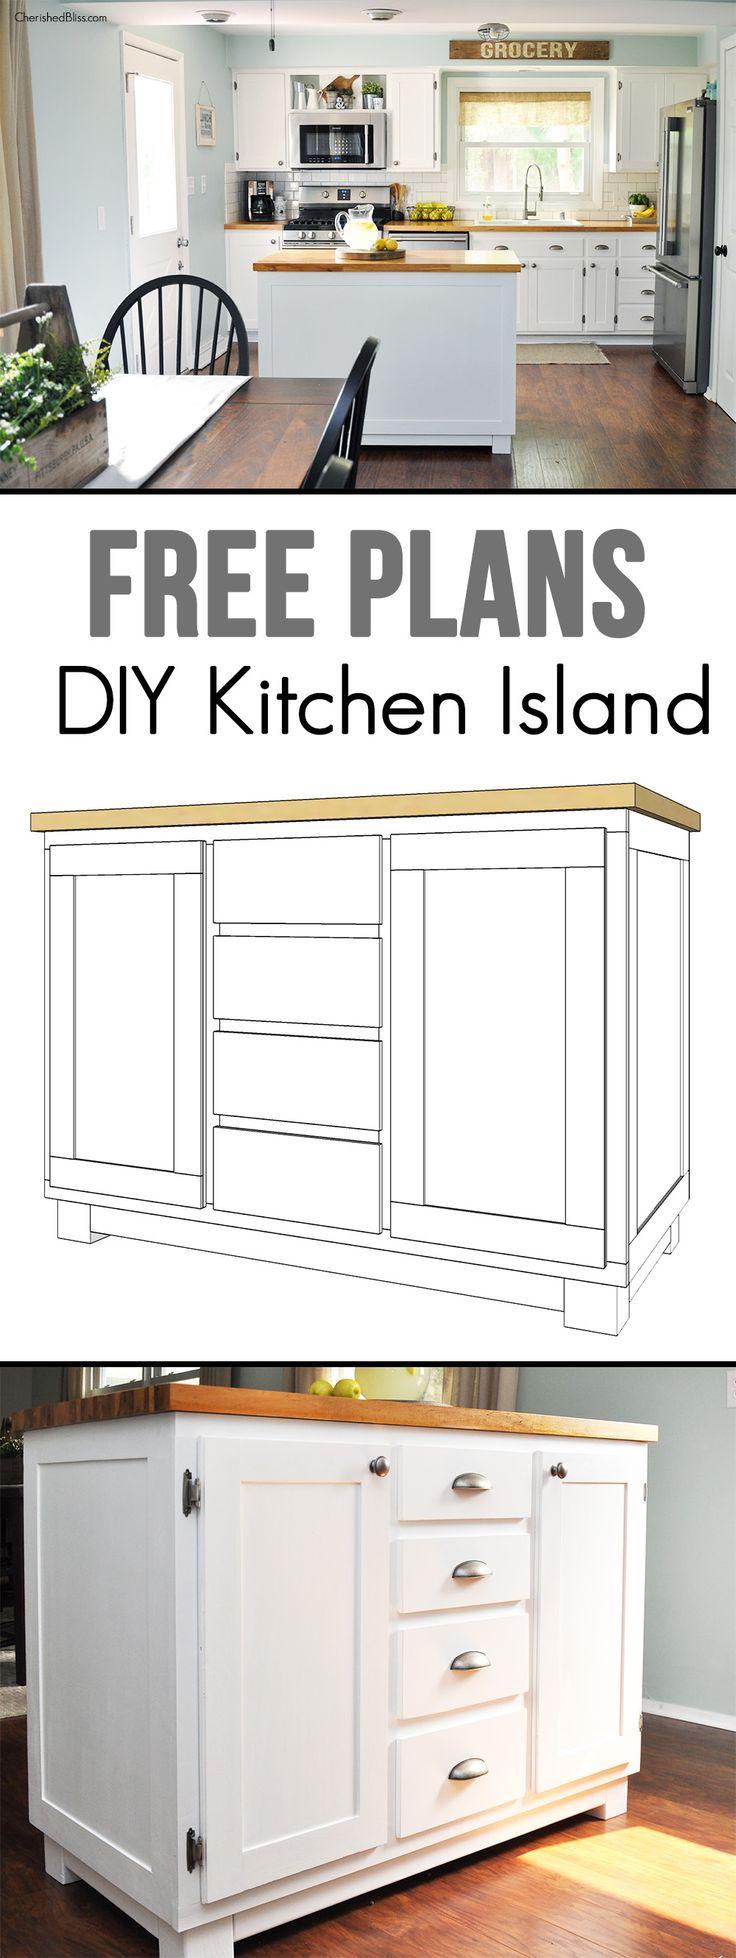 Best 25 Build kitchen island ideas on Pinterest  Build